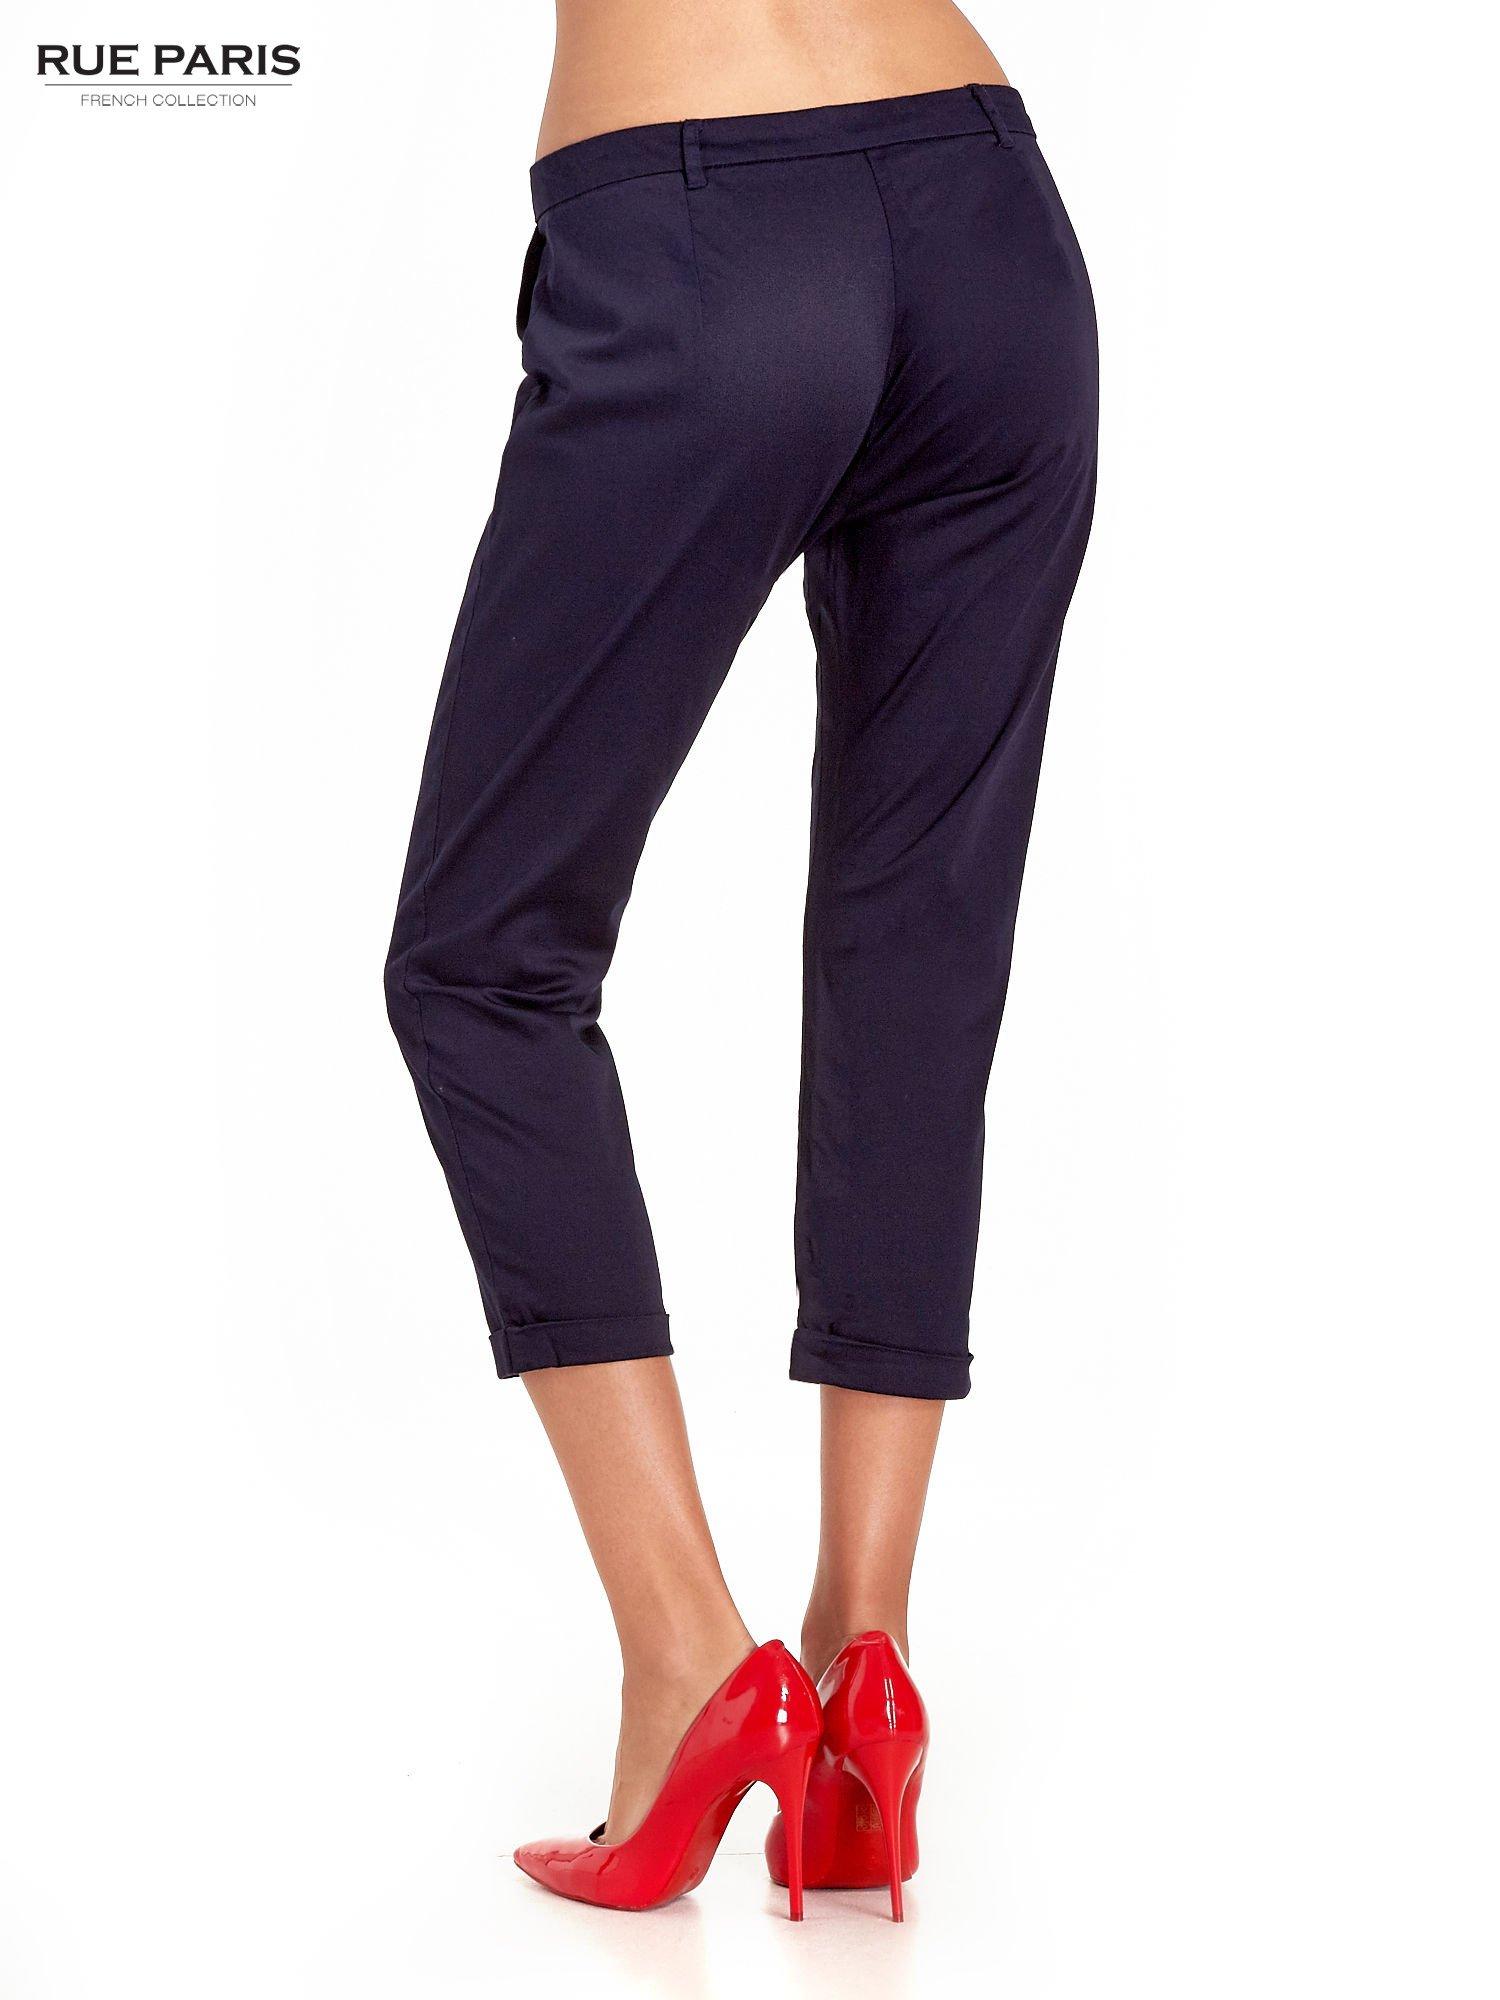 Granatowe eleganckie spodnie za kolano                                  zdj.                                  4